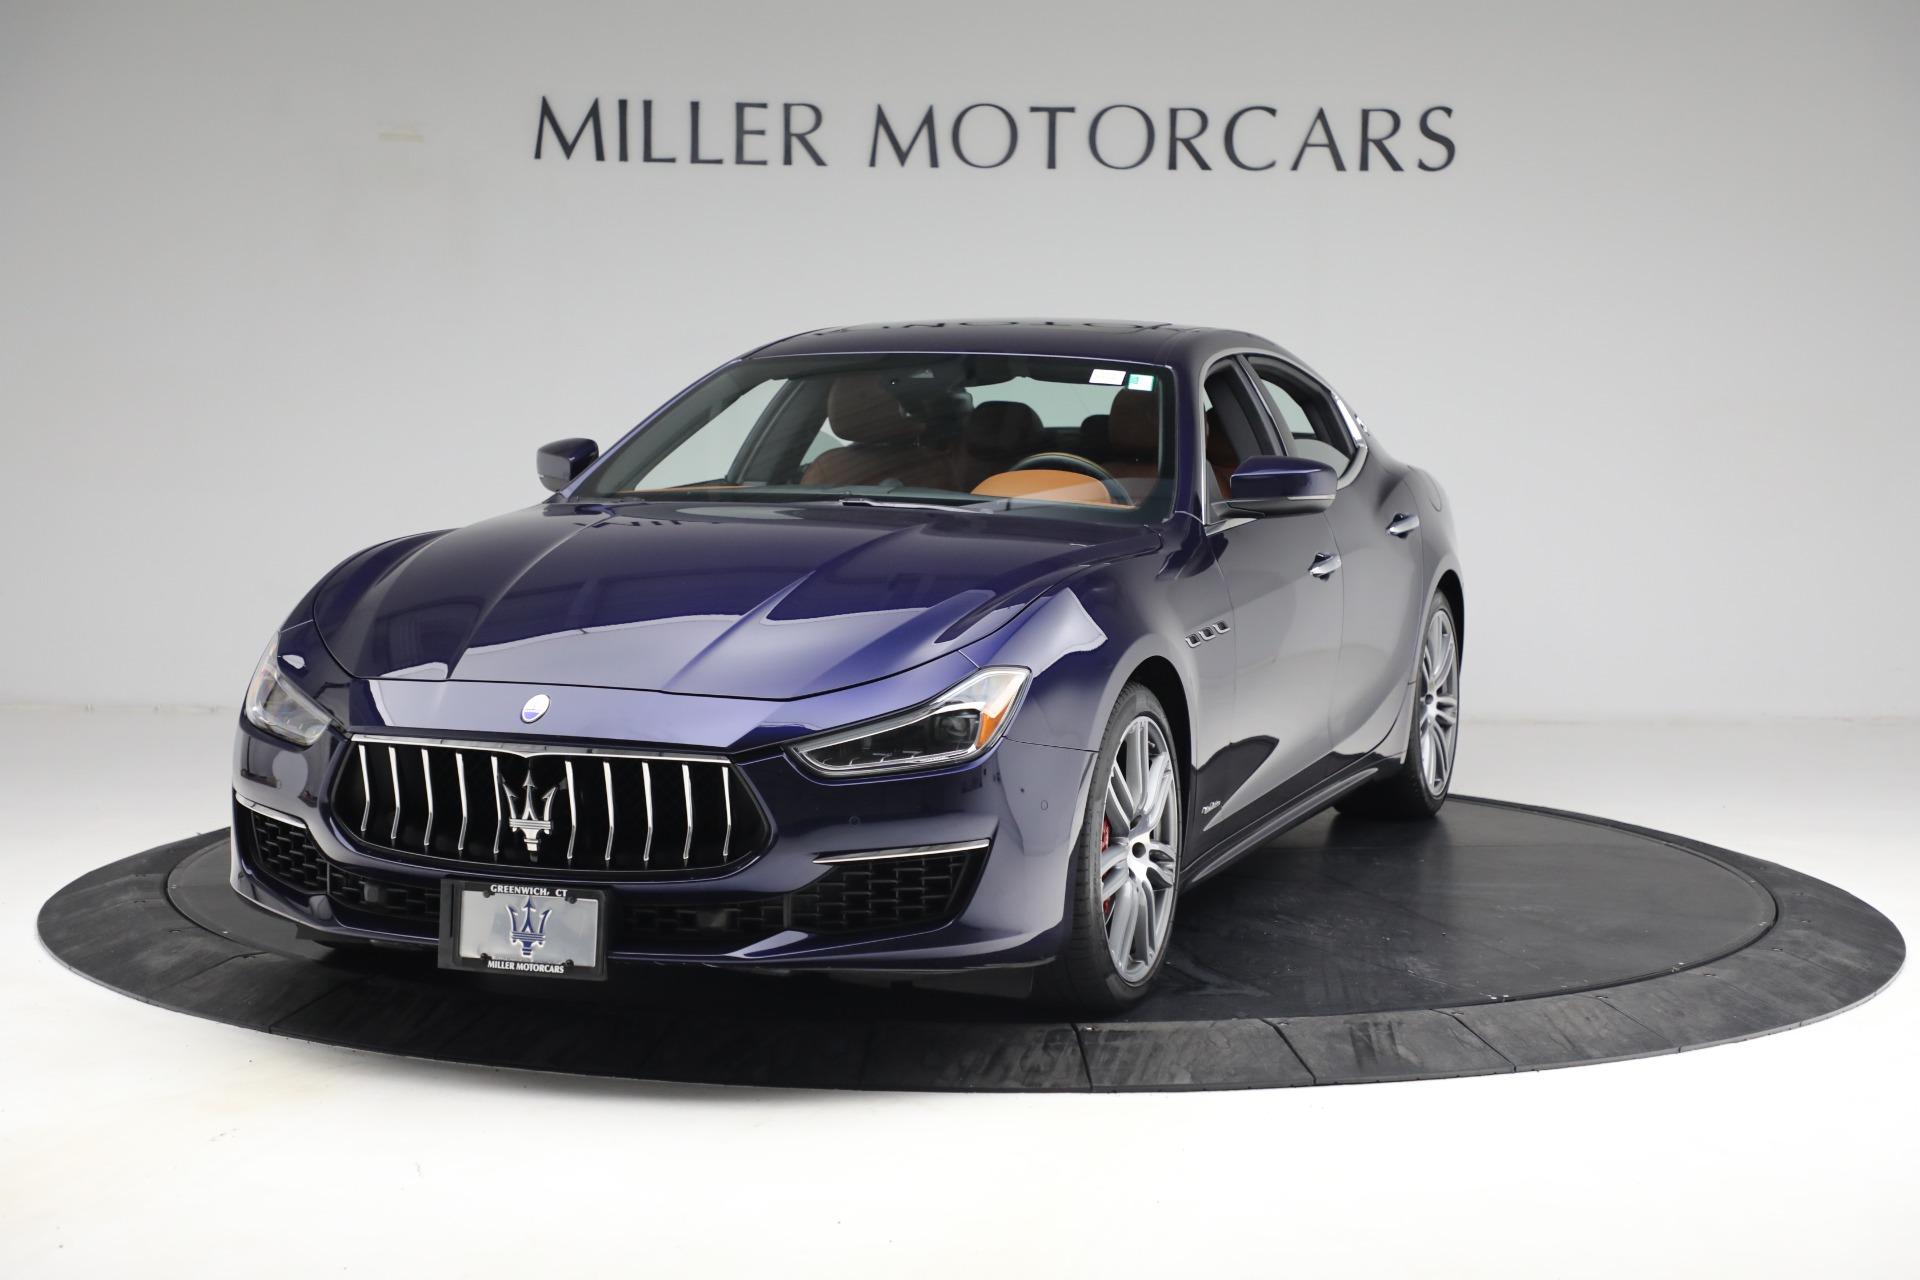 Used 2018 Maserati Ghibli S Q4 GranLusso for sale $56,900 at Aston Martin of Greenwich in Greenwich CT 06830 1